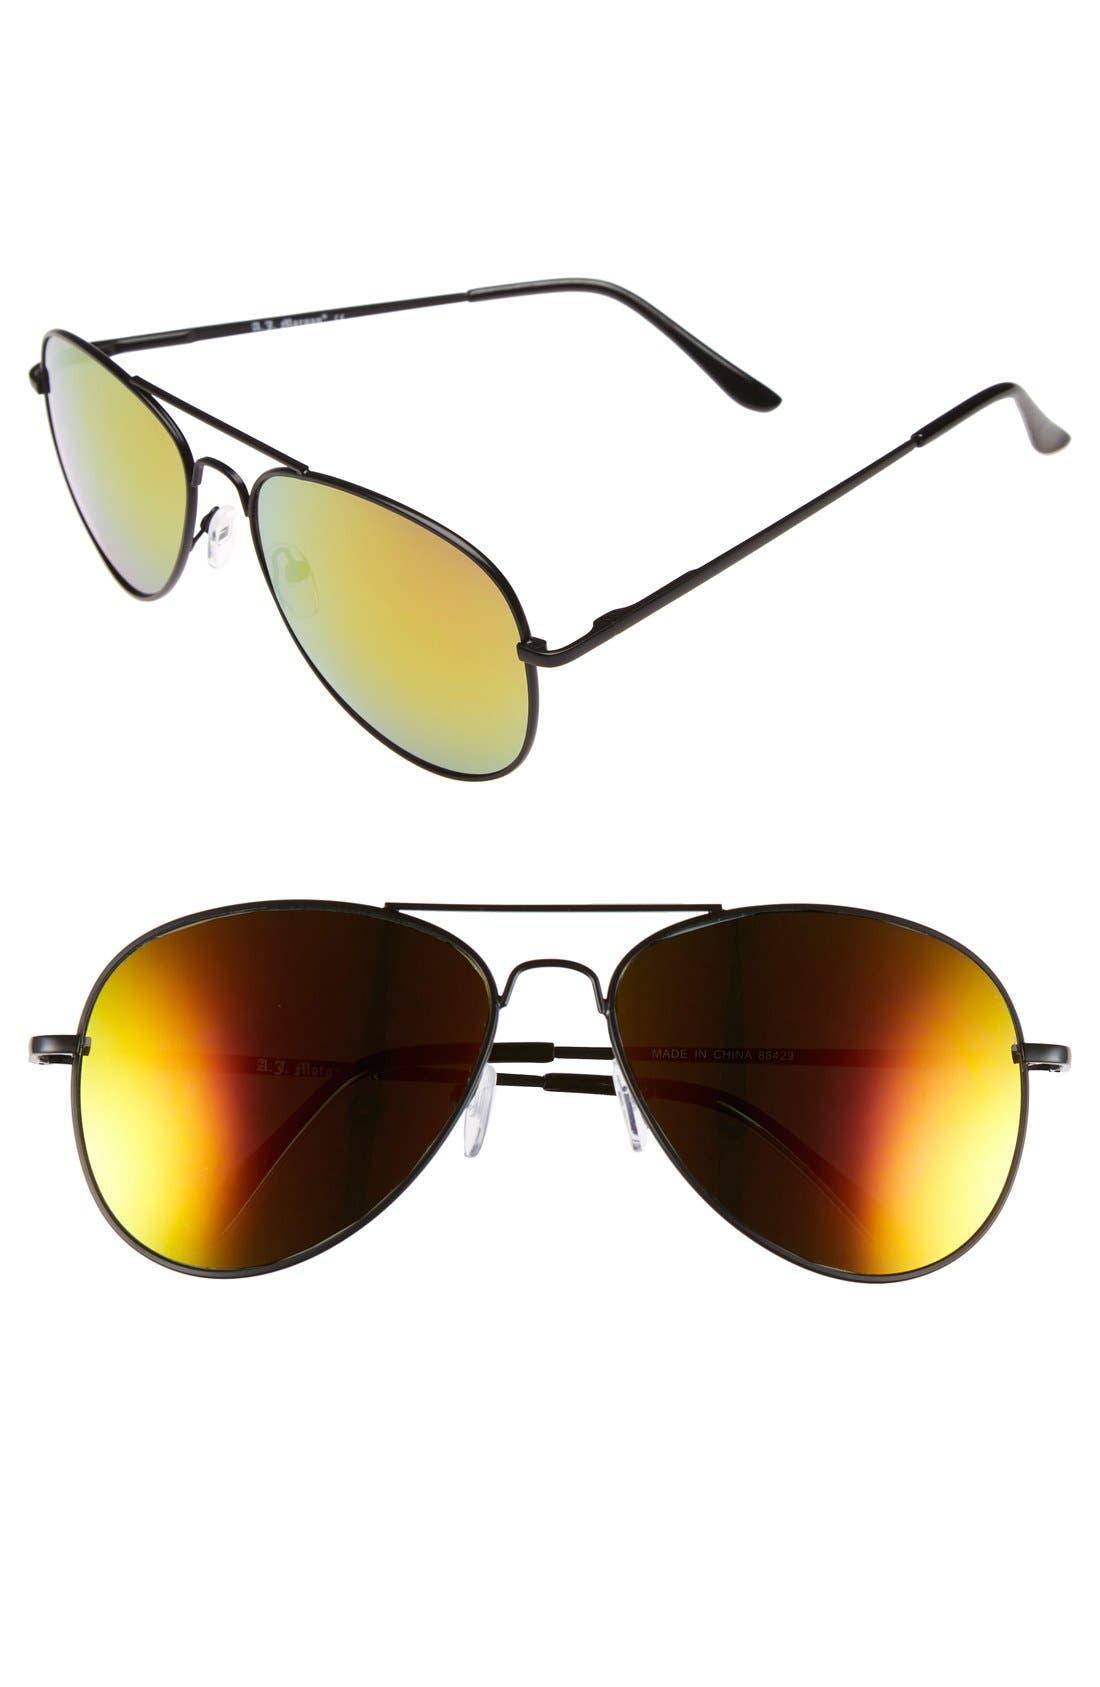 Alternate Image 1 Selected - A.J. Morgan 'Skyline' 58mm Aviator Sunglasses